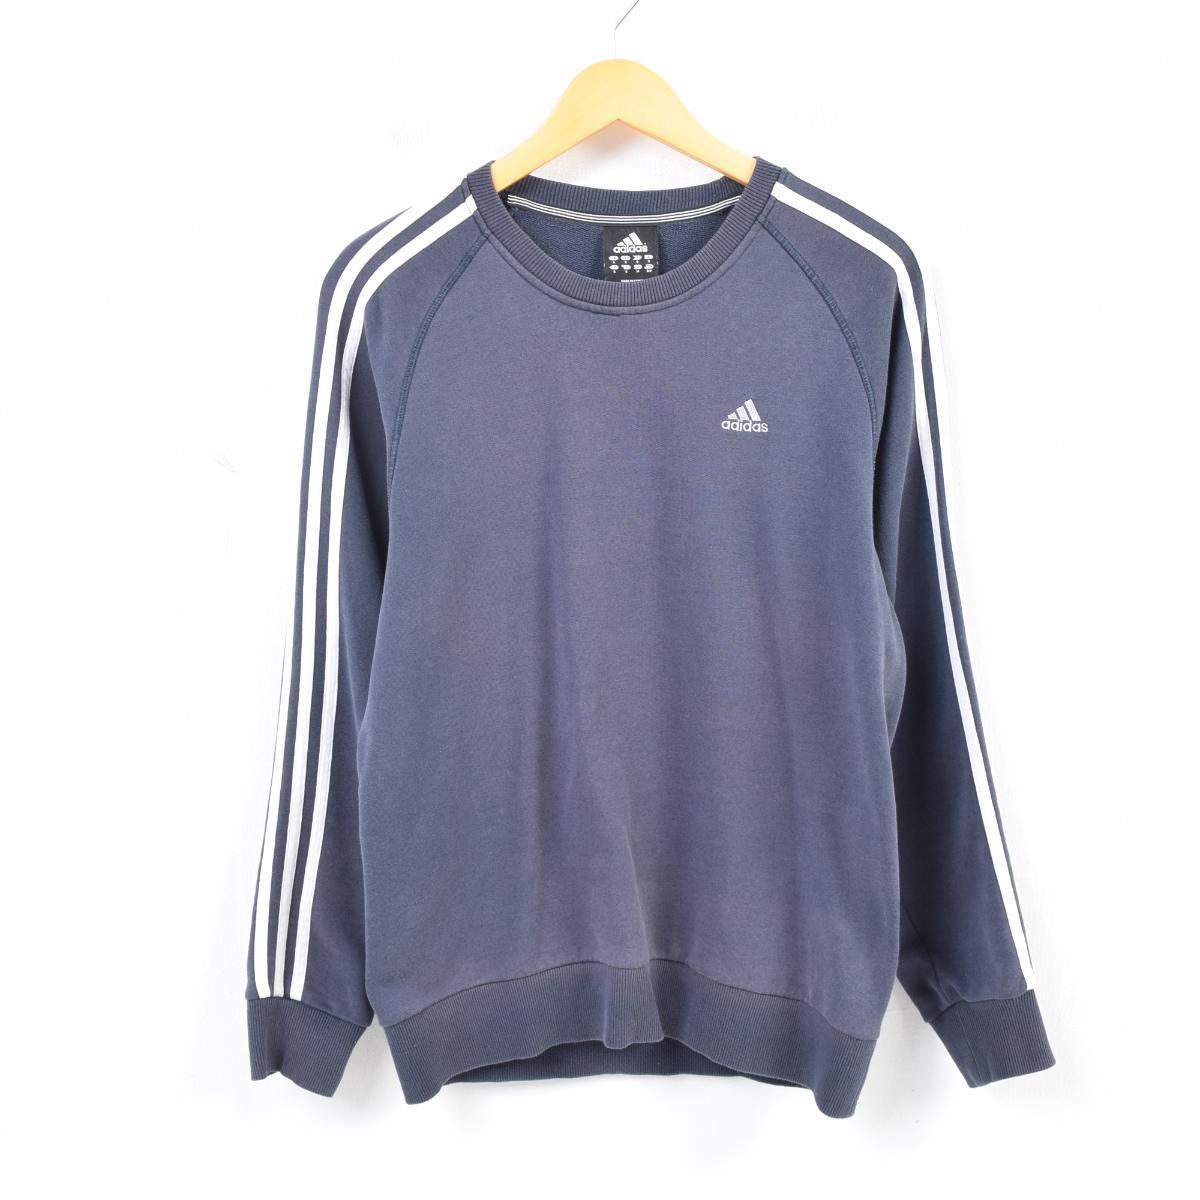 VINTAGE CLOTHING JAM   Rakuten Global Market  Adidas adidas one ... ad72082a194d